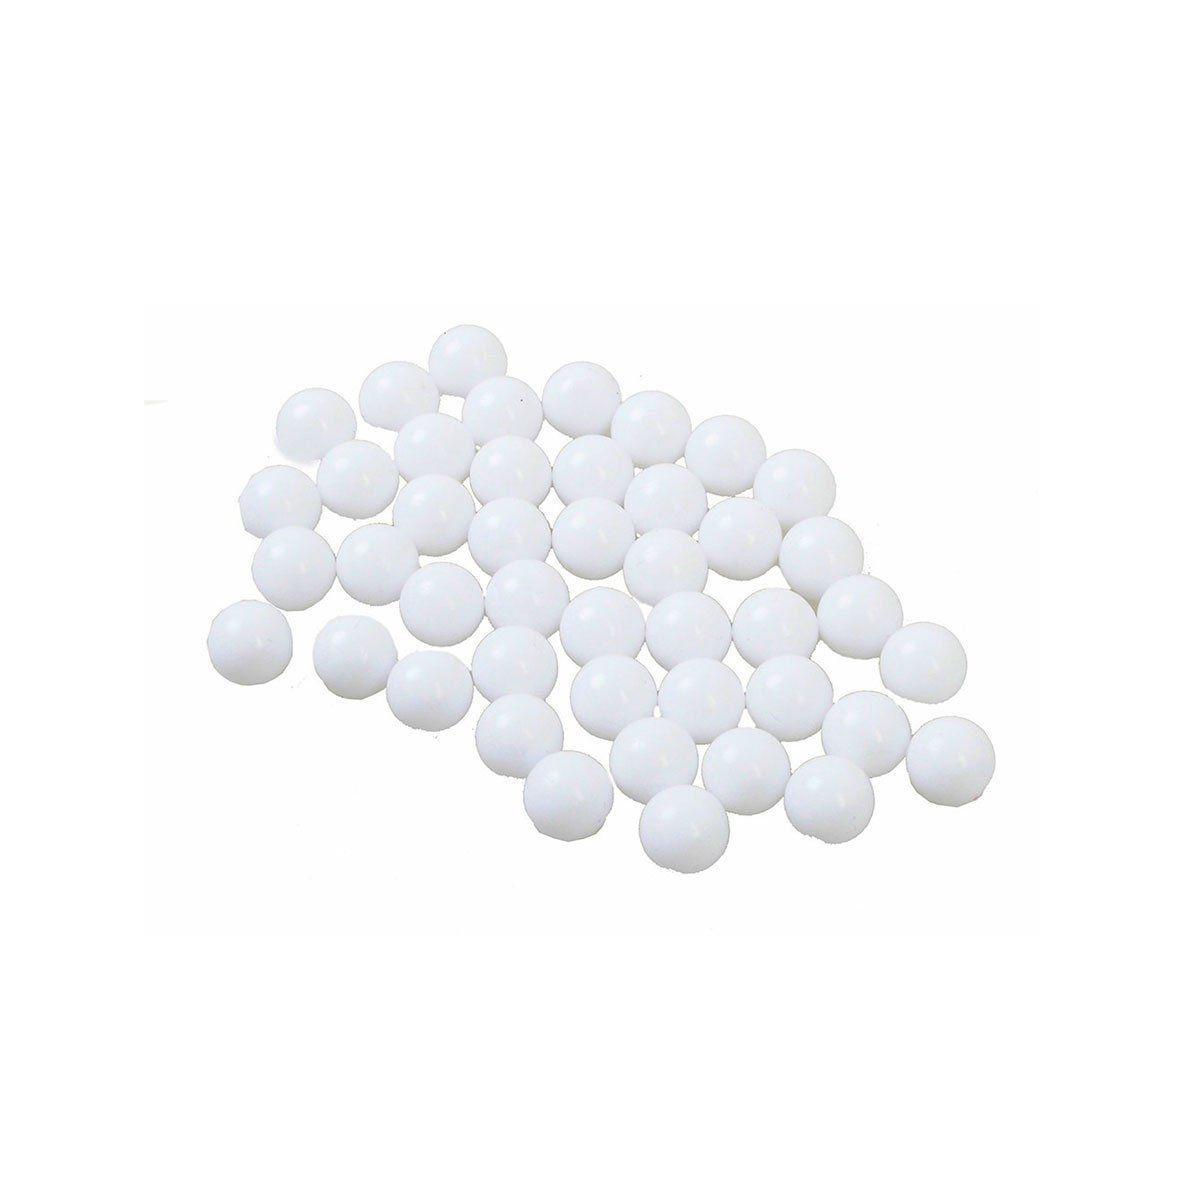 Esferas Plásticas BBs Nautika Calibre 6mm 0,12g 2000un